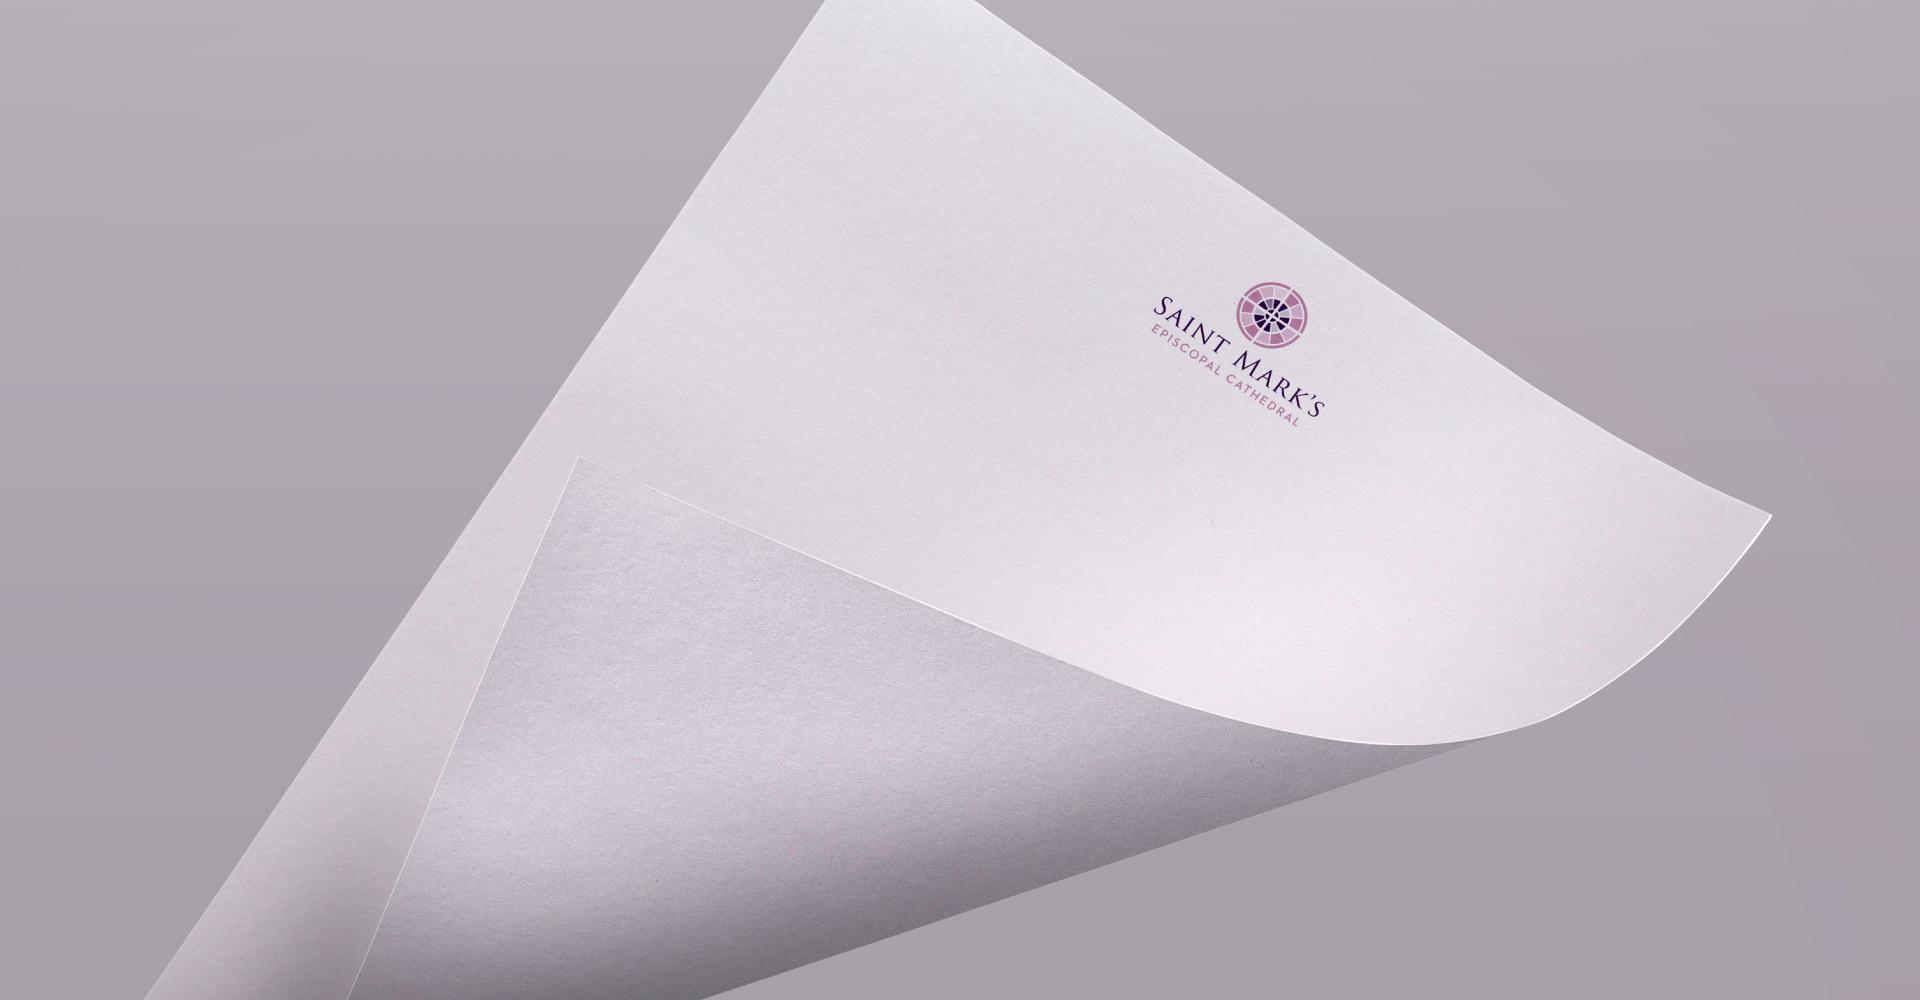 Creative_Retail_Packaging_Saint_Marks_Episcopal_Cathedral_Branding_Identity_8.jpg